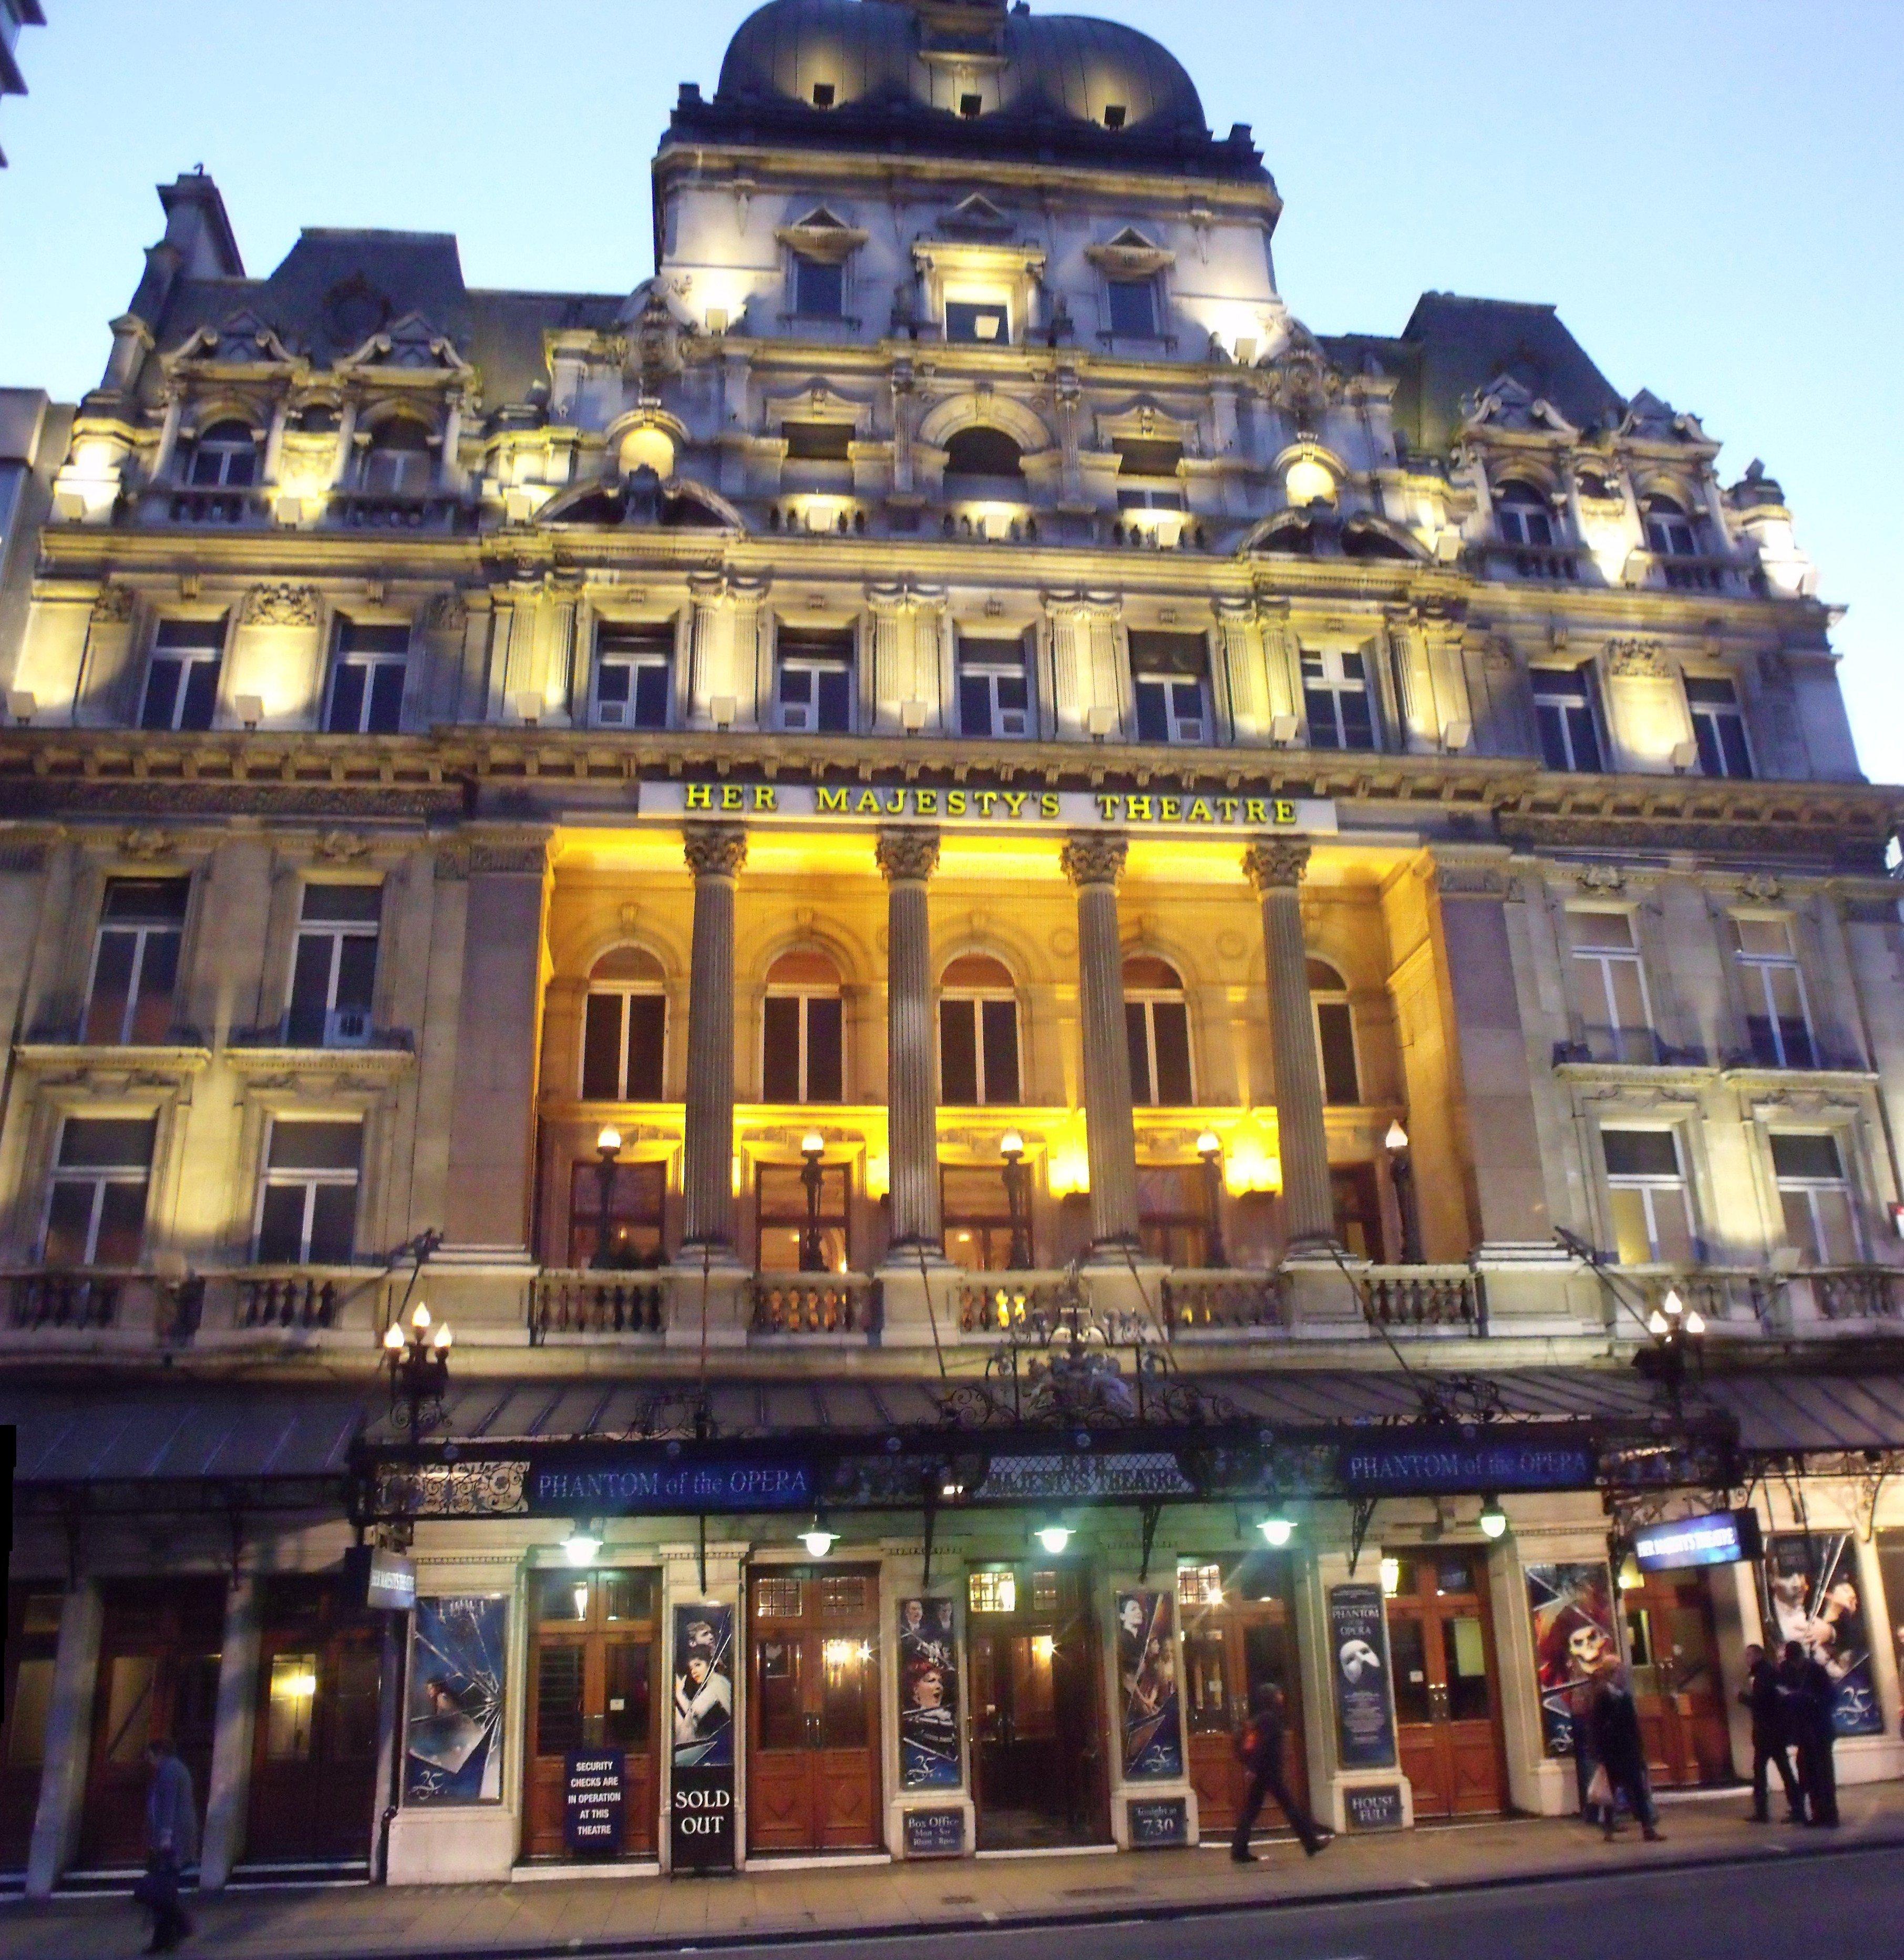 Her_Majestys_Theatre_-_Haymarket,_London_-_The_Phantom_of_the_Opera_(6438904139)